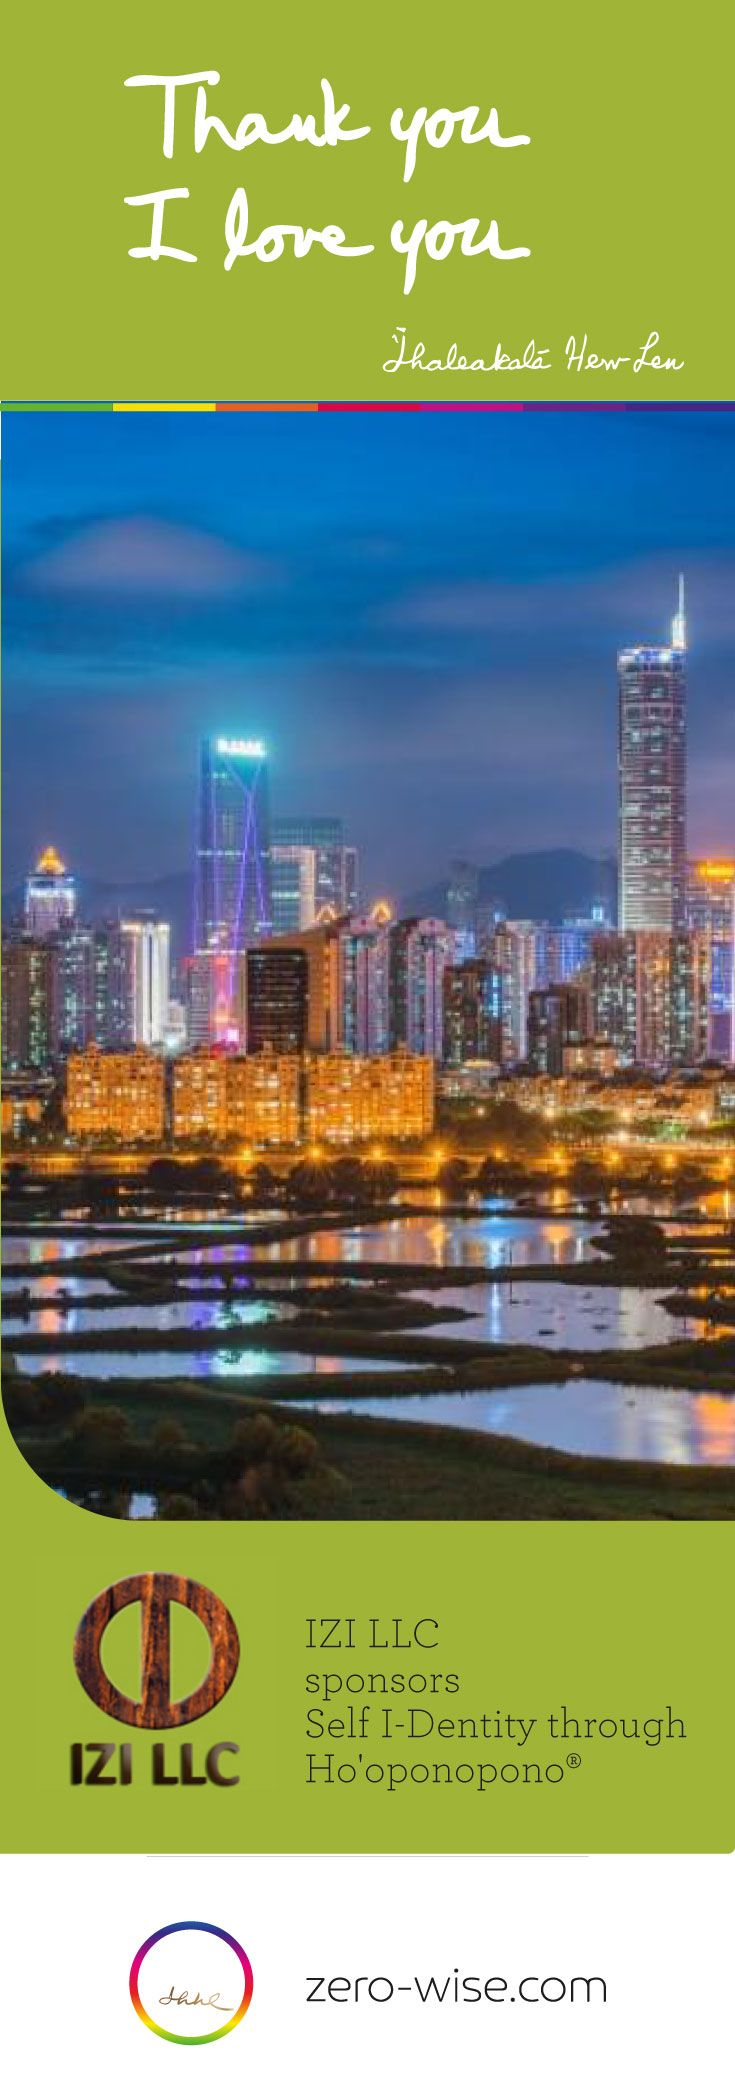 IZI LLC  sponsors Self I-Dentity through   Ho'oponopono® BUSINESS   You're Invited to Shenzhen, China! December 10-11, 2016  (English with Chinese translation)